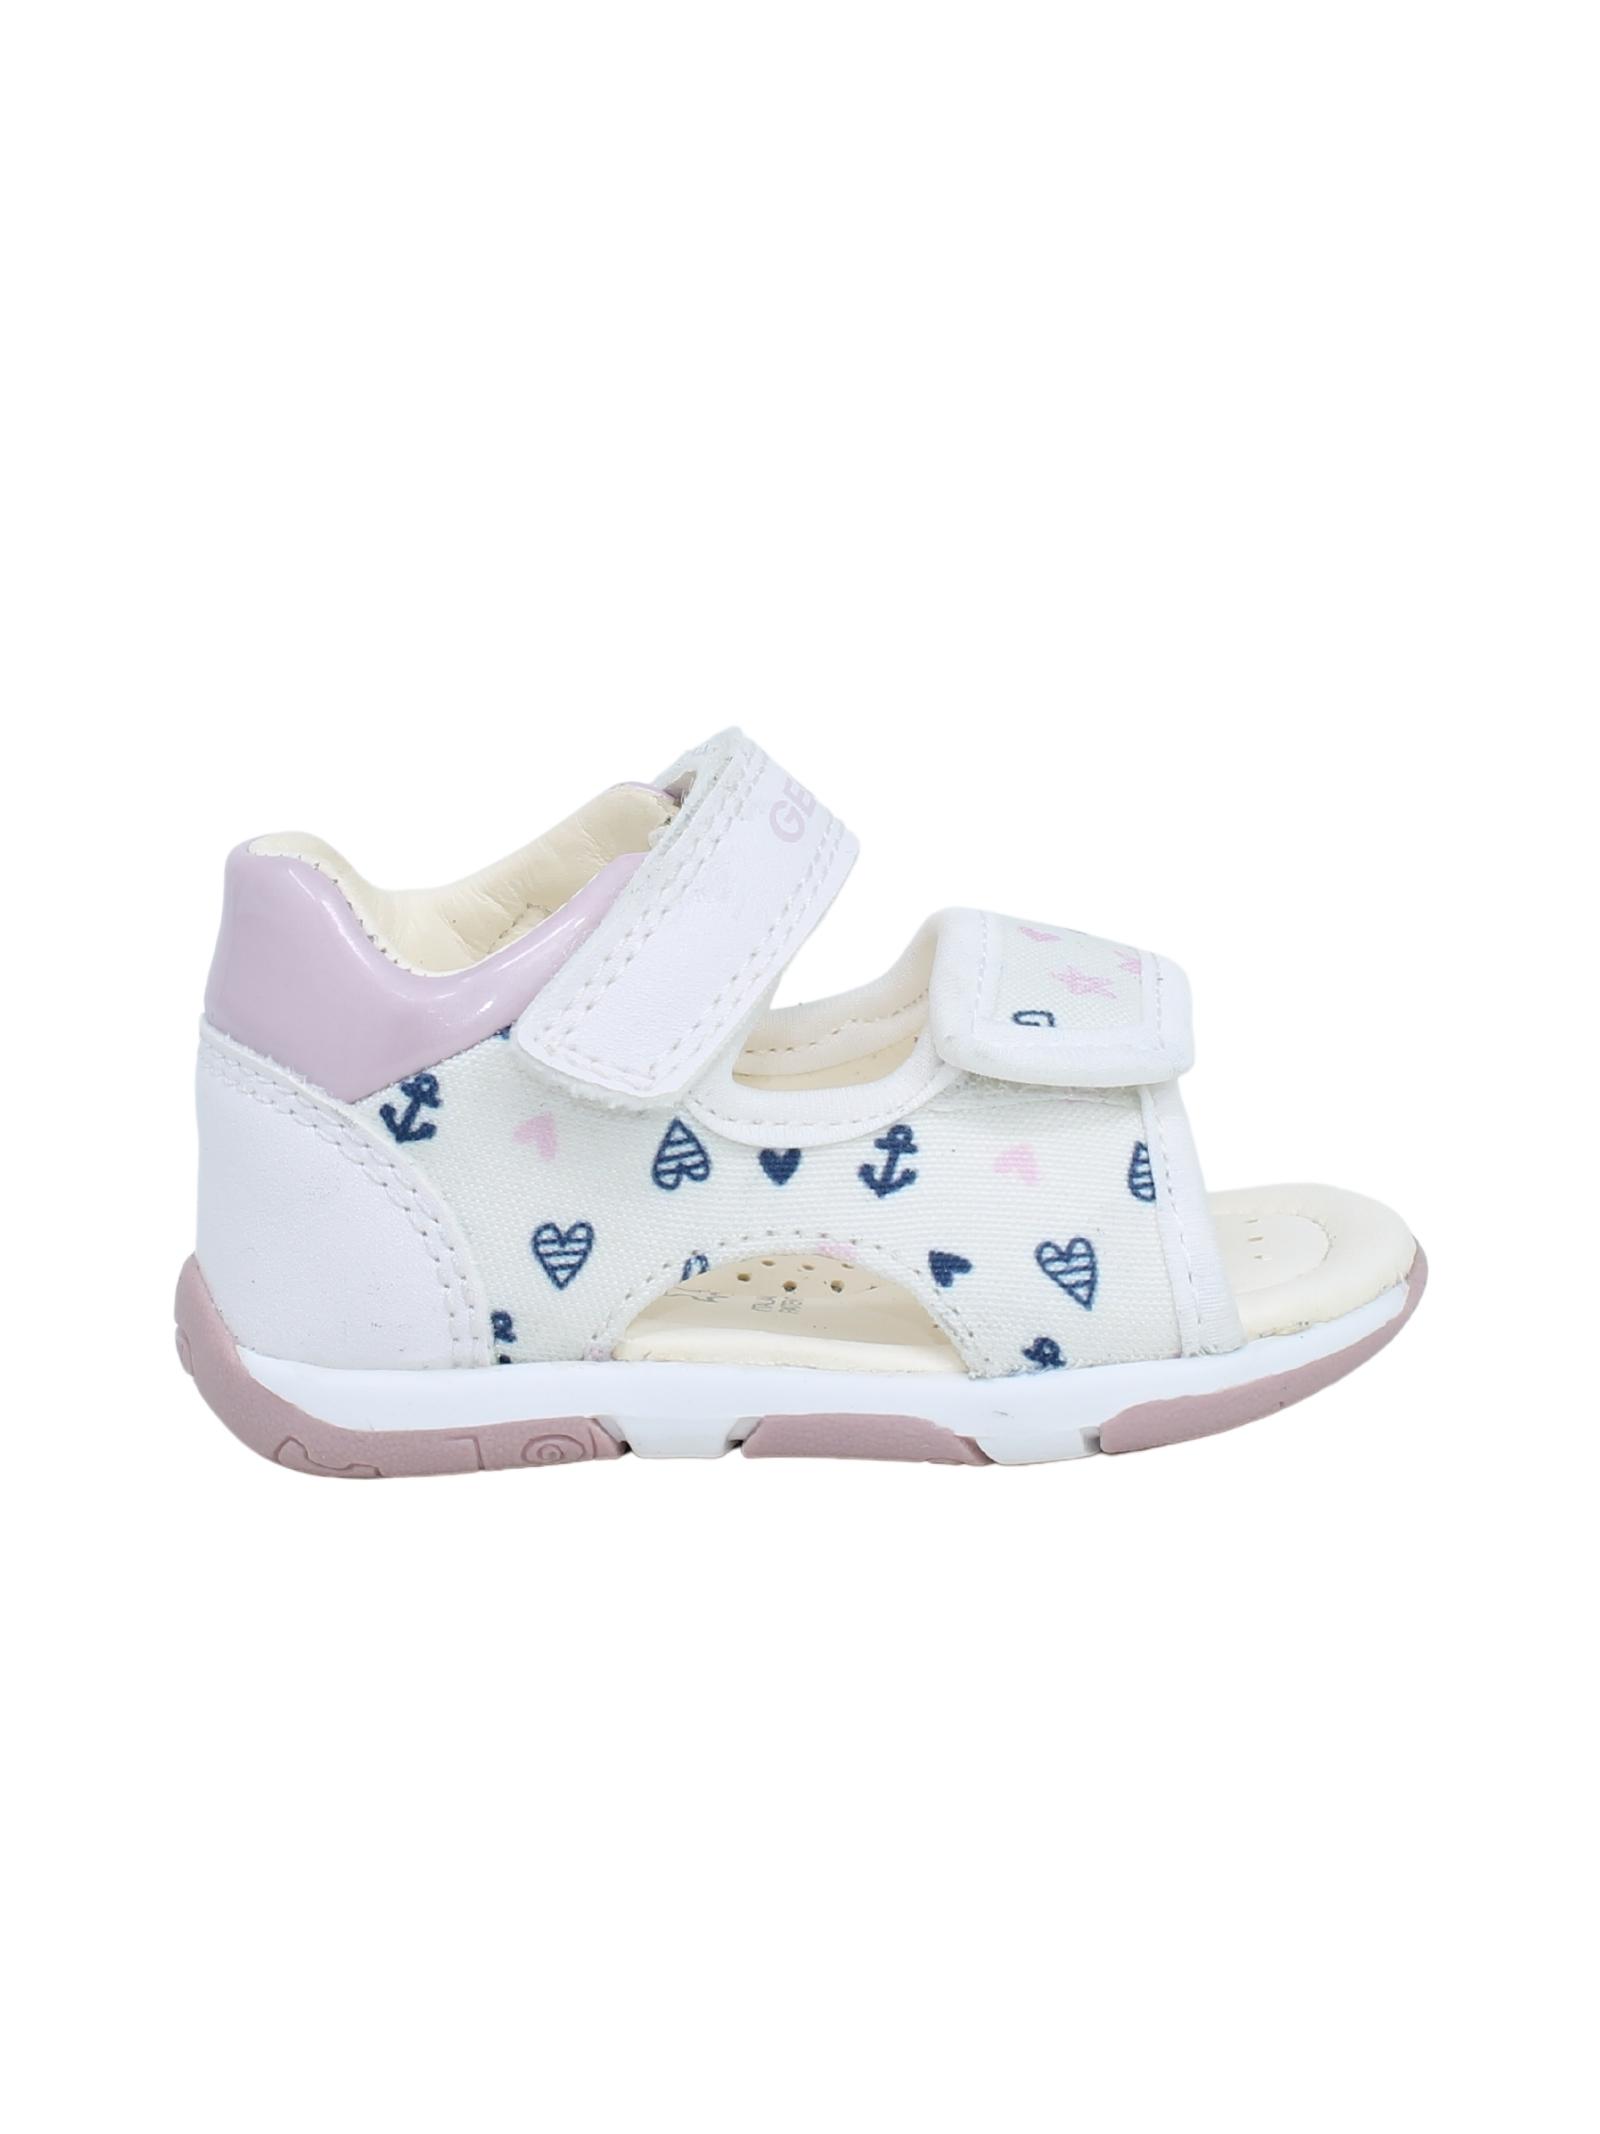 Sandalo Bambina Cuori GEOX KIDS | Sandali | 6995ROSA